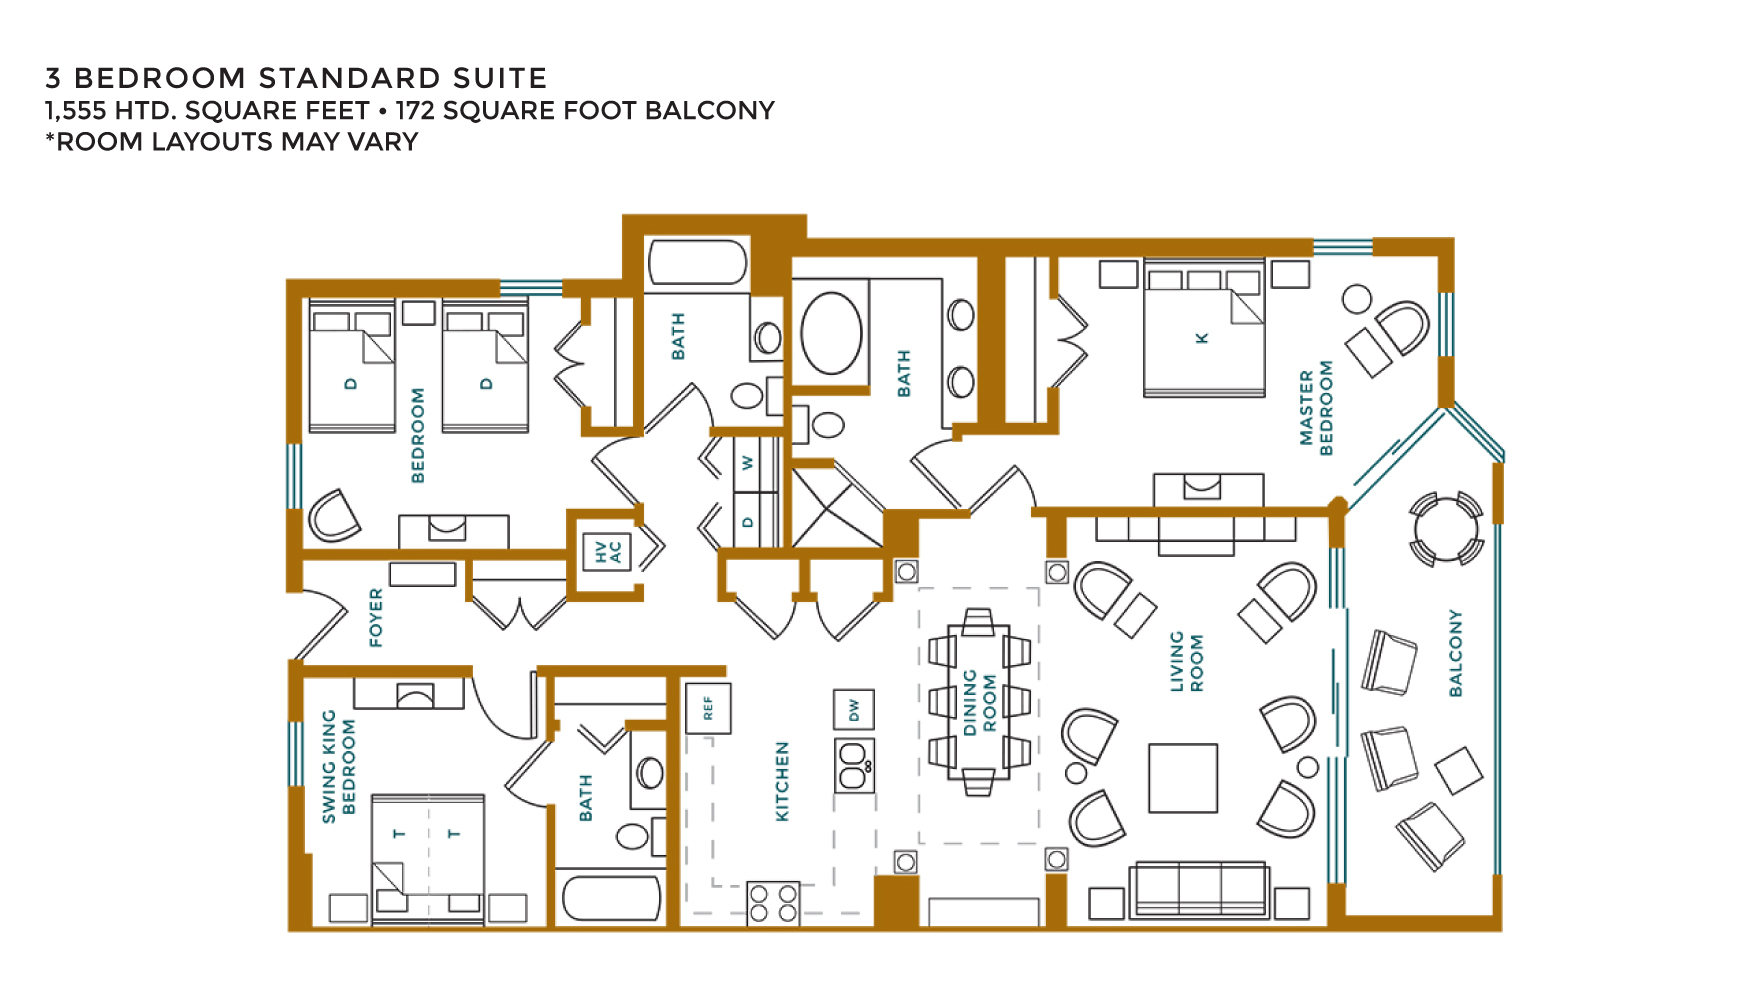 3 Bedroom Suites at Island Vista Resort Myrtle Beach